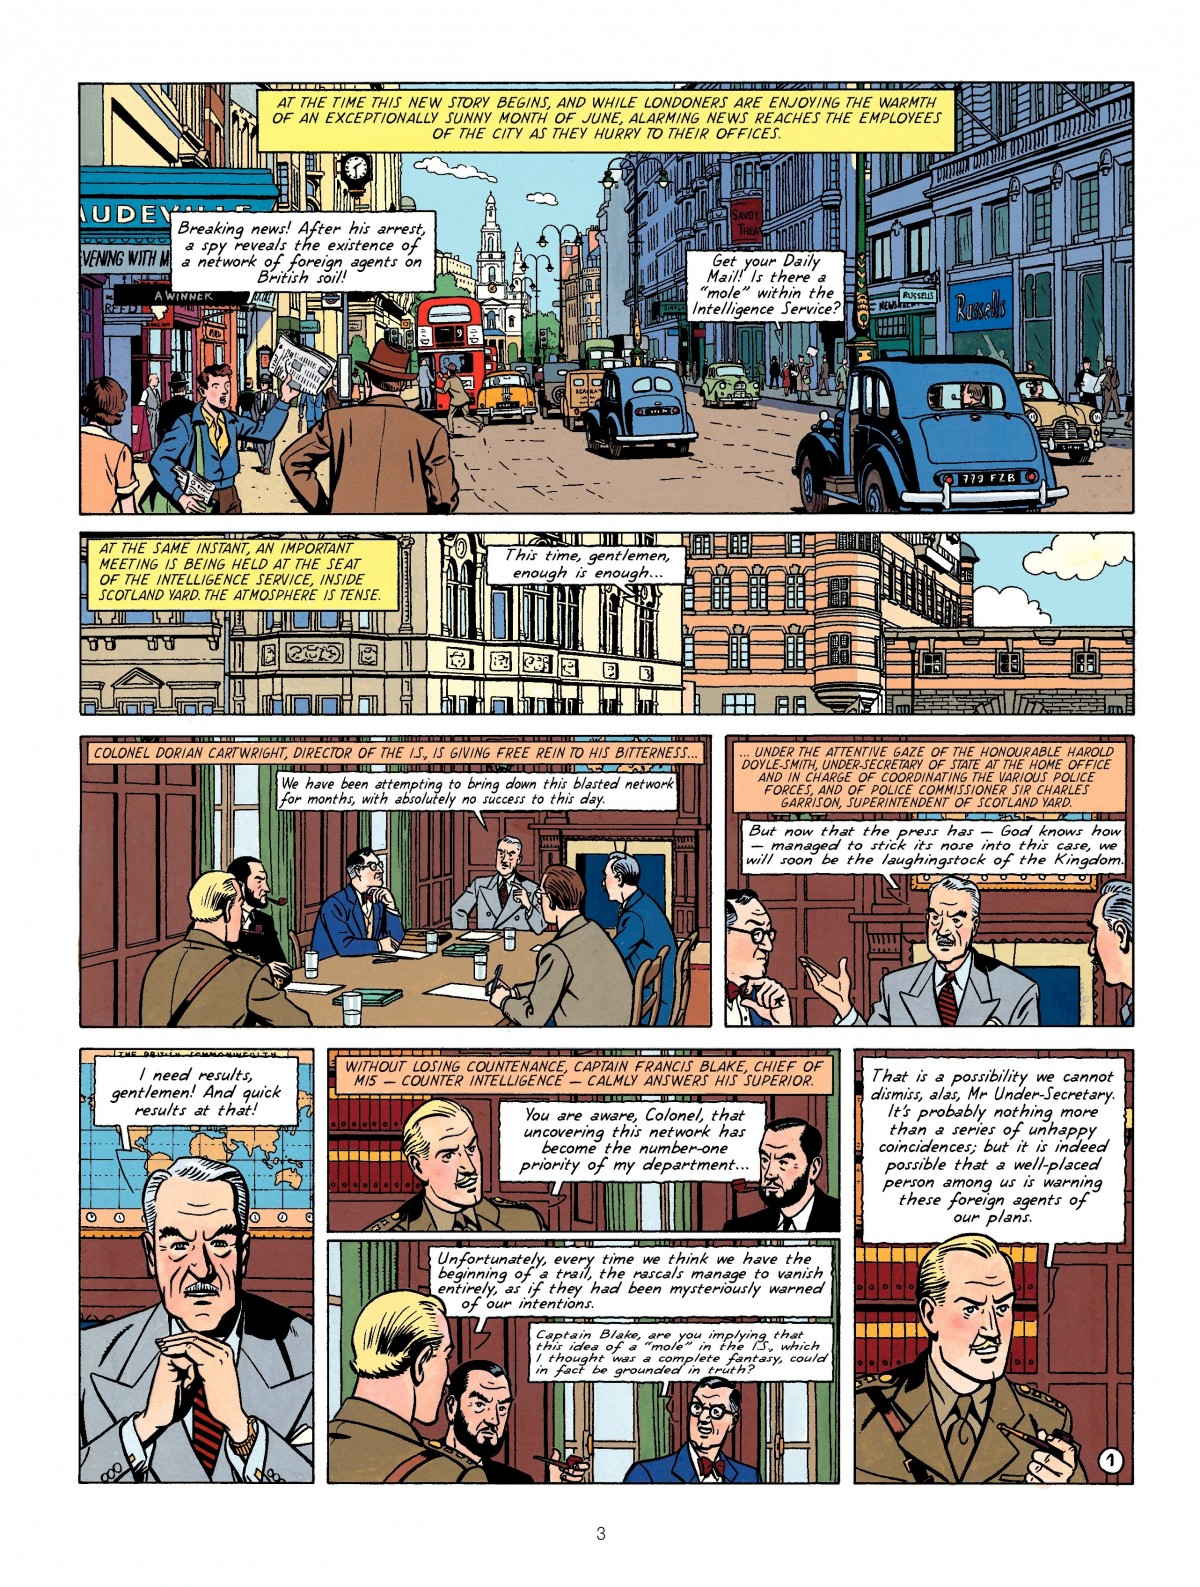 Blake and Mortimer The Francis Blake Affair review